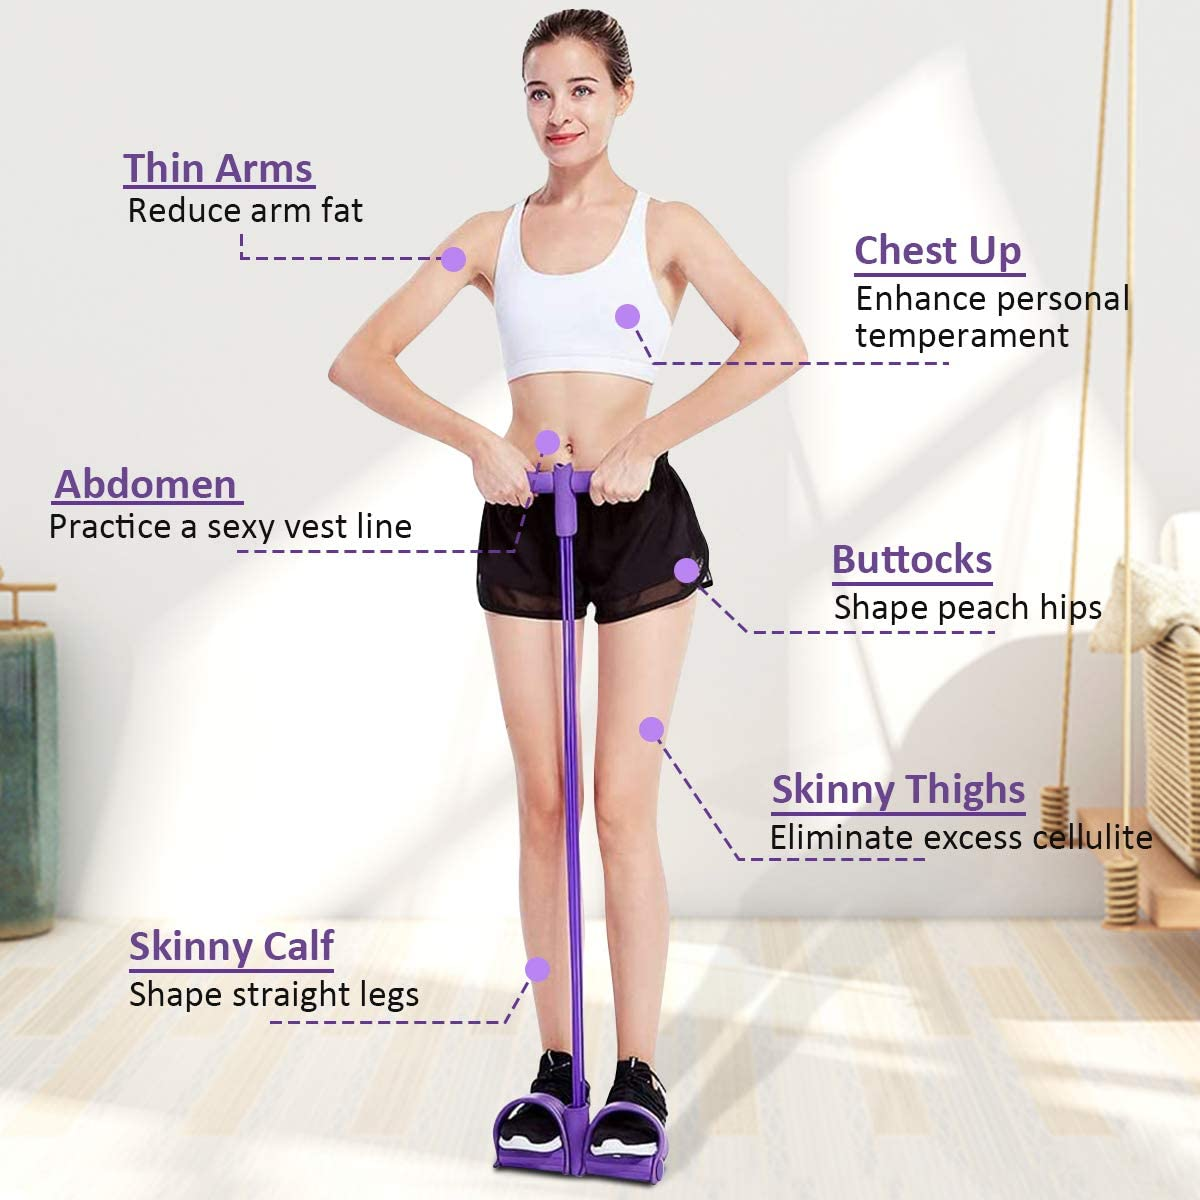 PullPritt Multifunktions Fitness Sit-up Trainings Seil Trainingsband mit Pedal Yoga Stretching Beintrainer Bauchtrainer Widerstand Trainingsger/ät Leg Exerciser mit 4 Tubes Elastische Zugseil